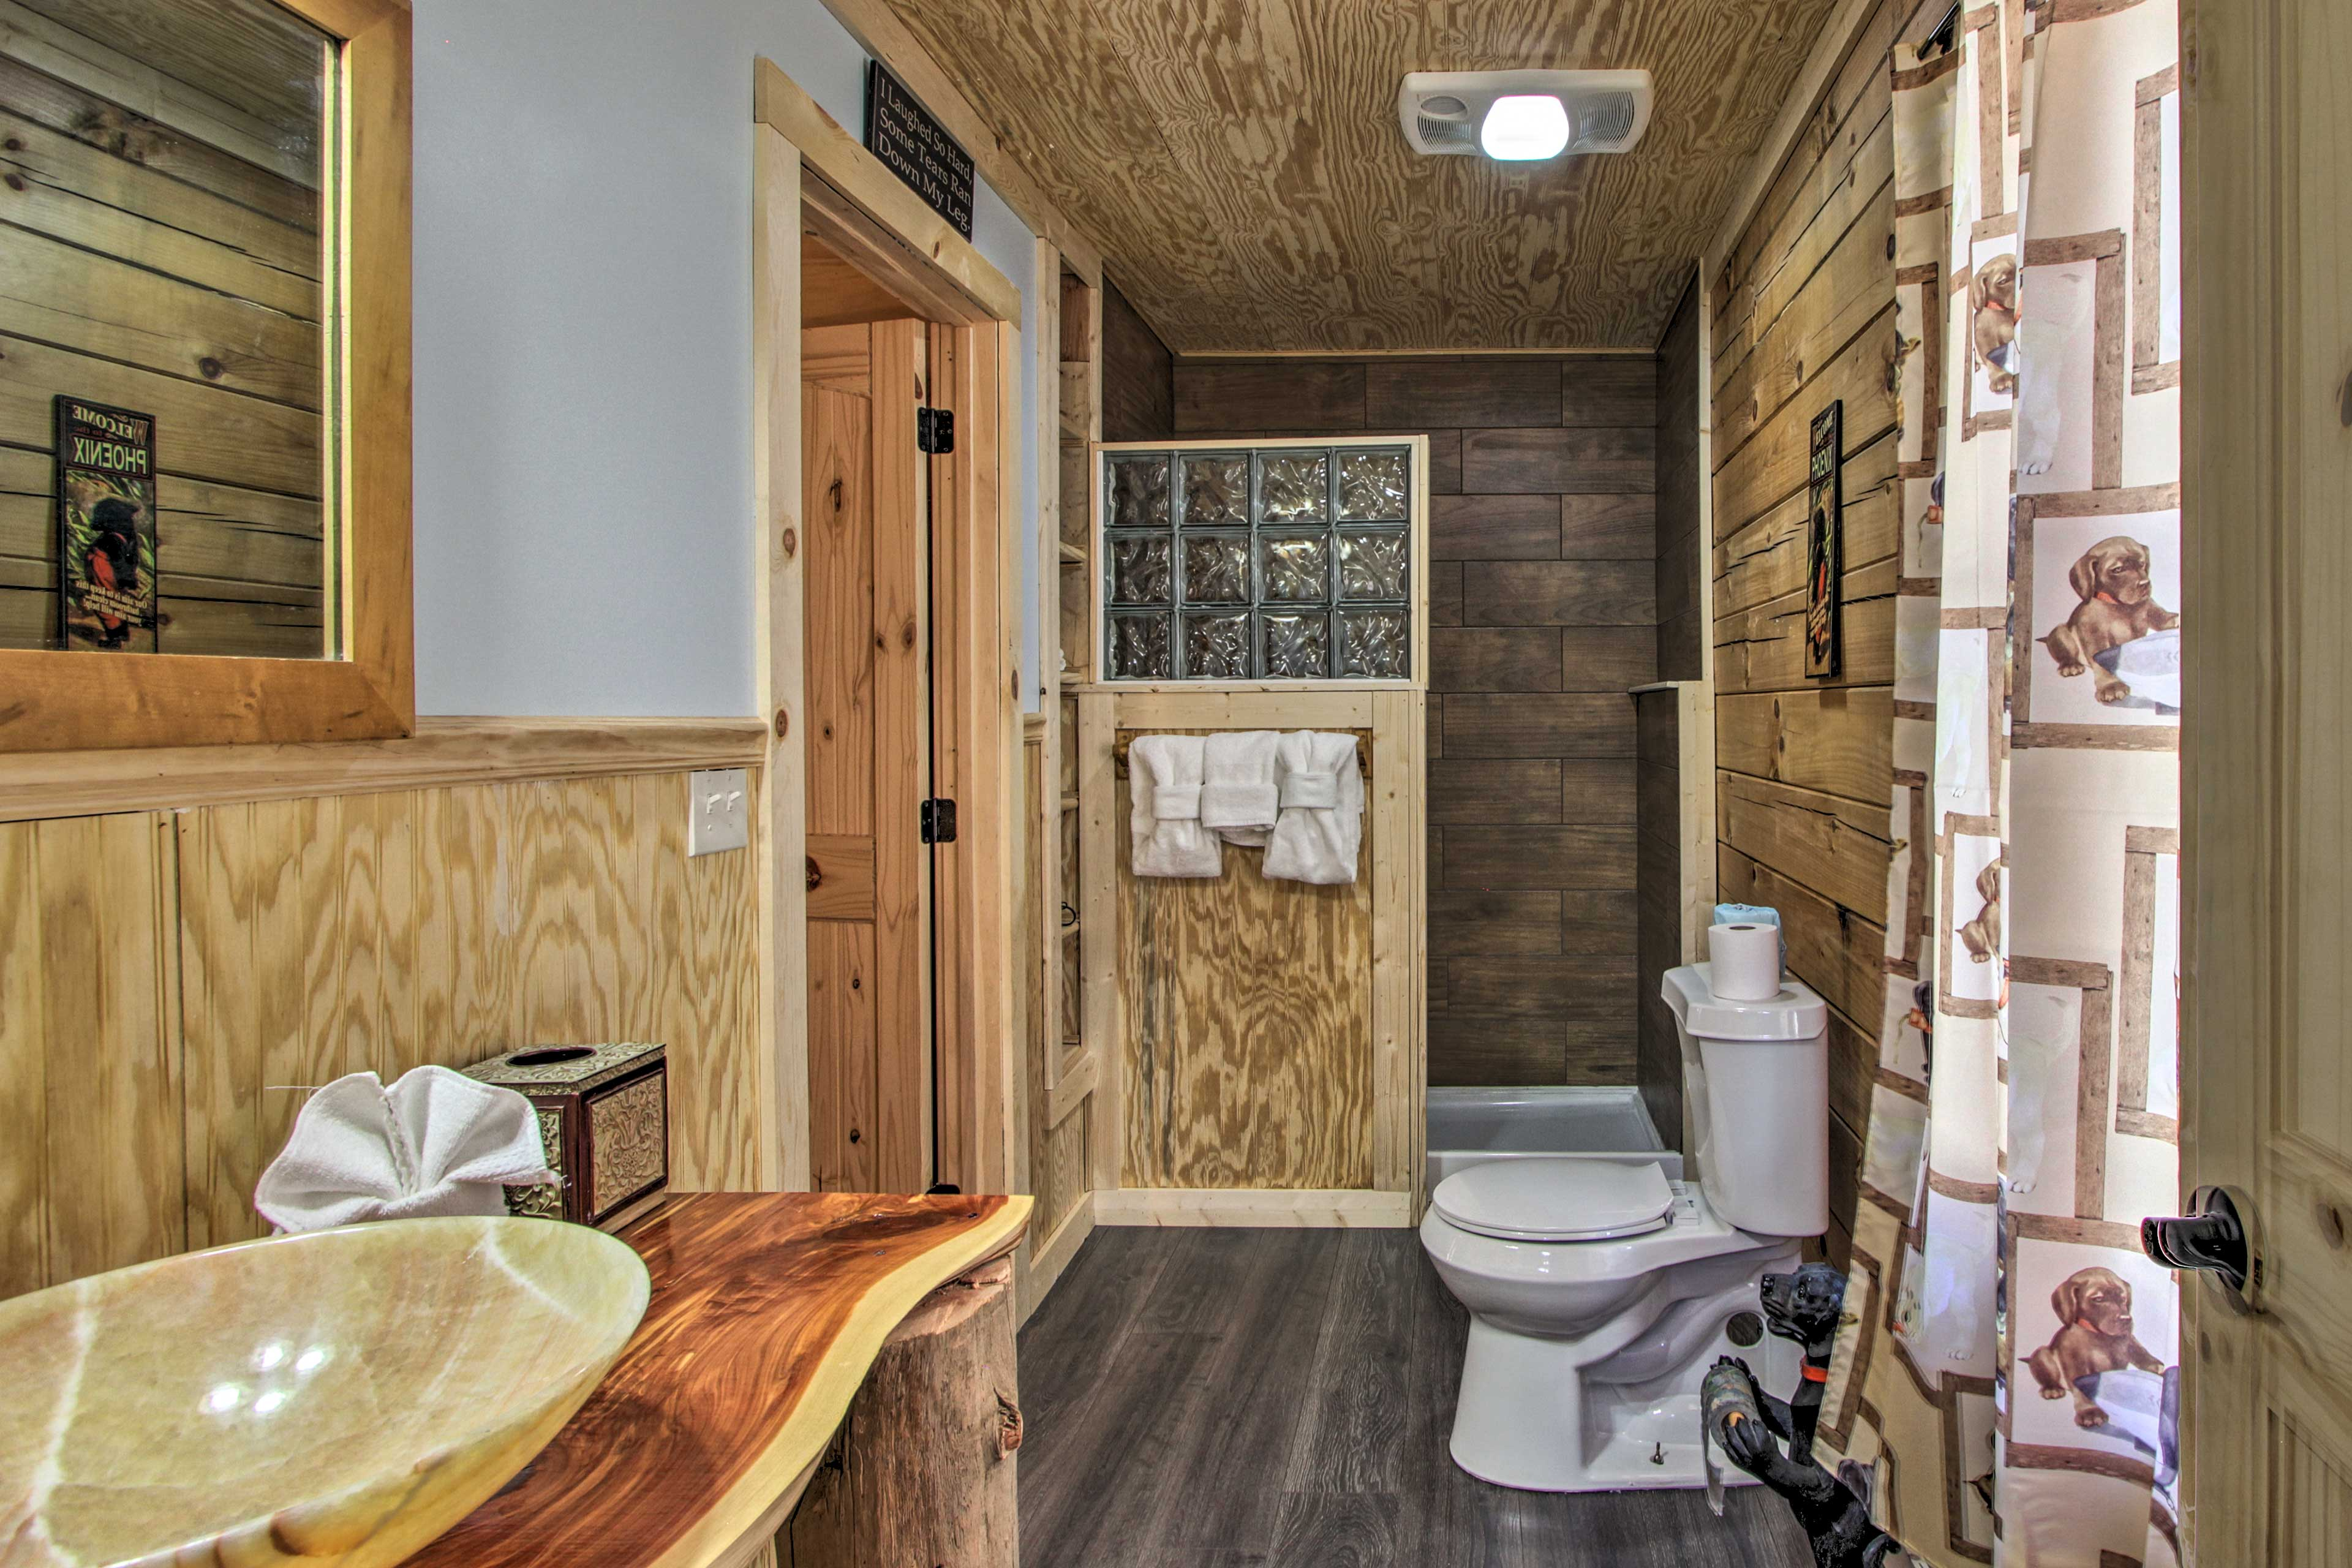 Enjoy an en-suite bathroom with a glass block adorned shower.